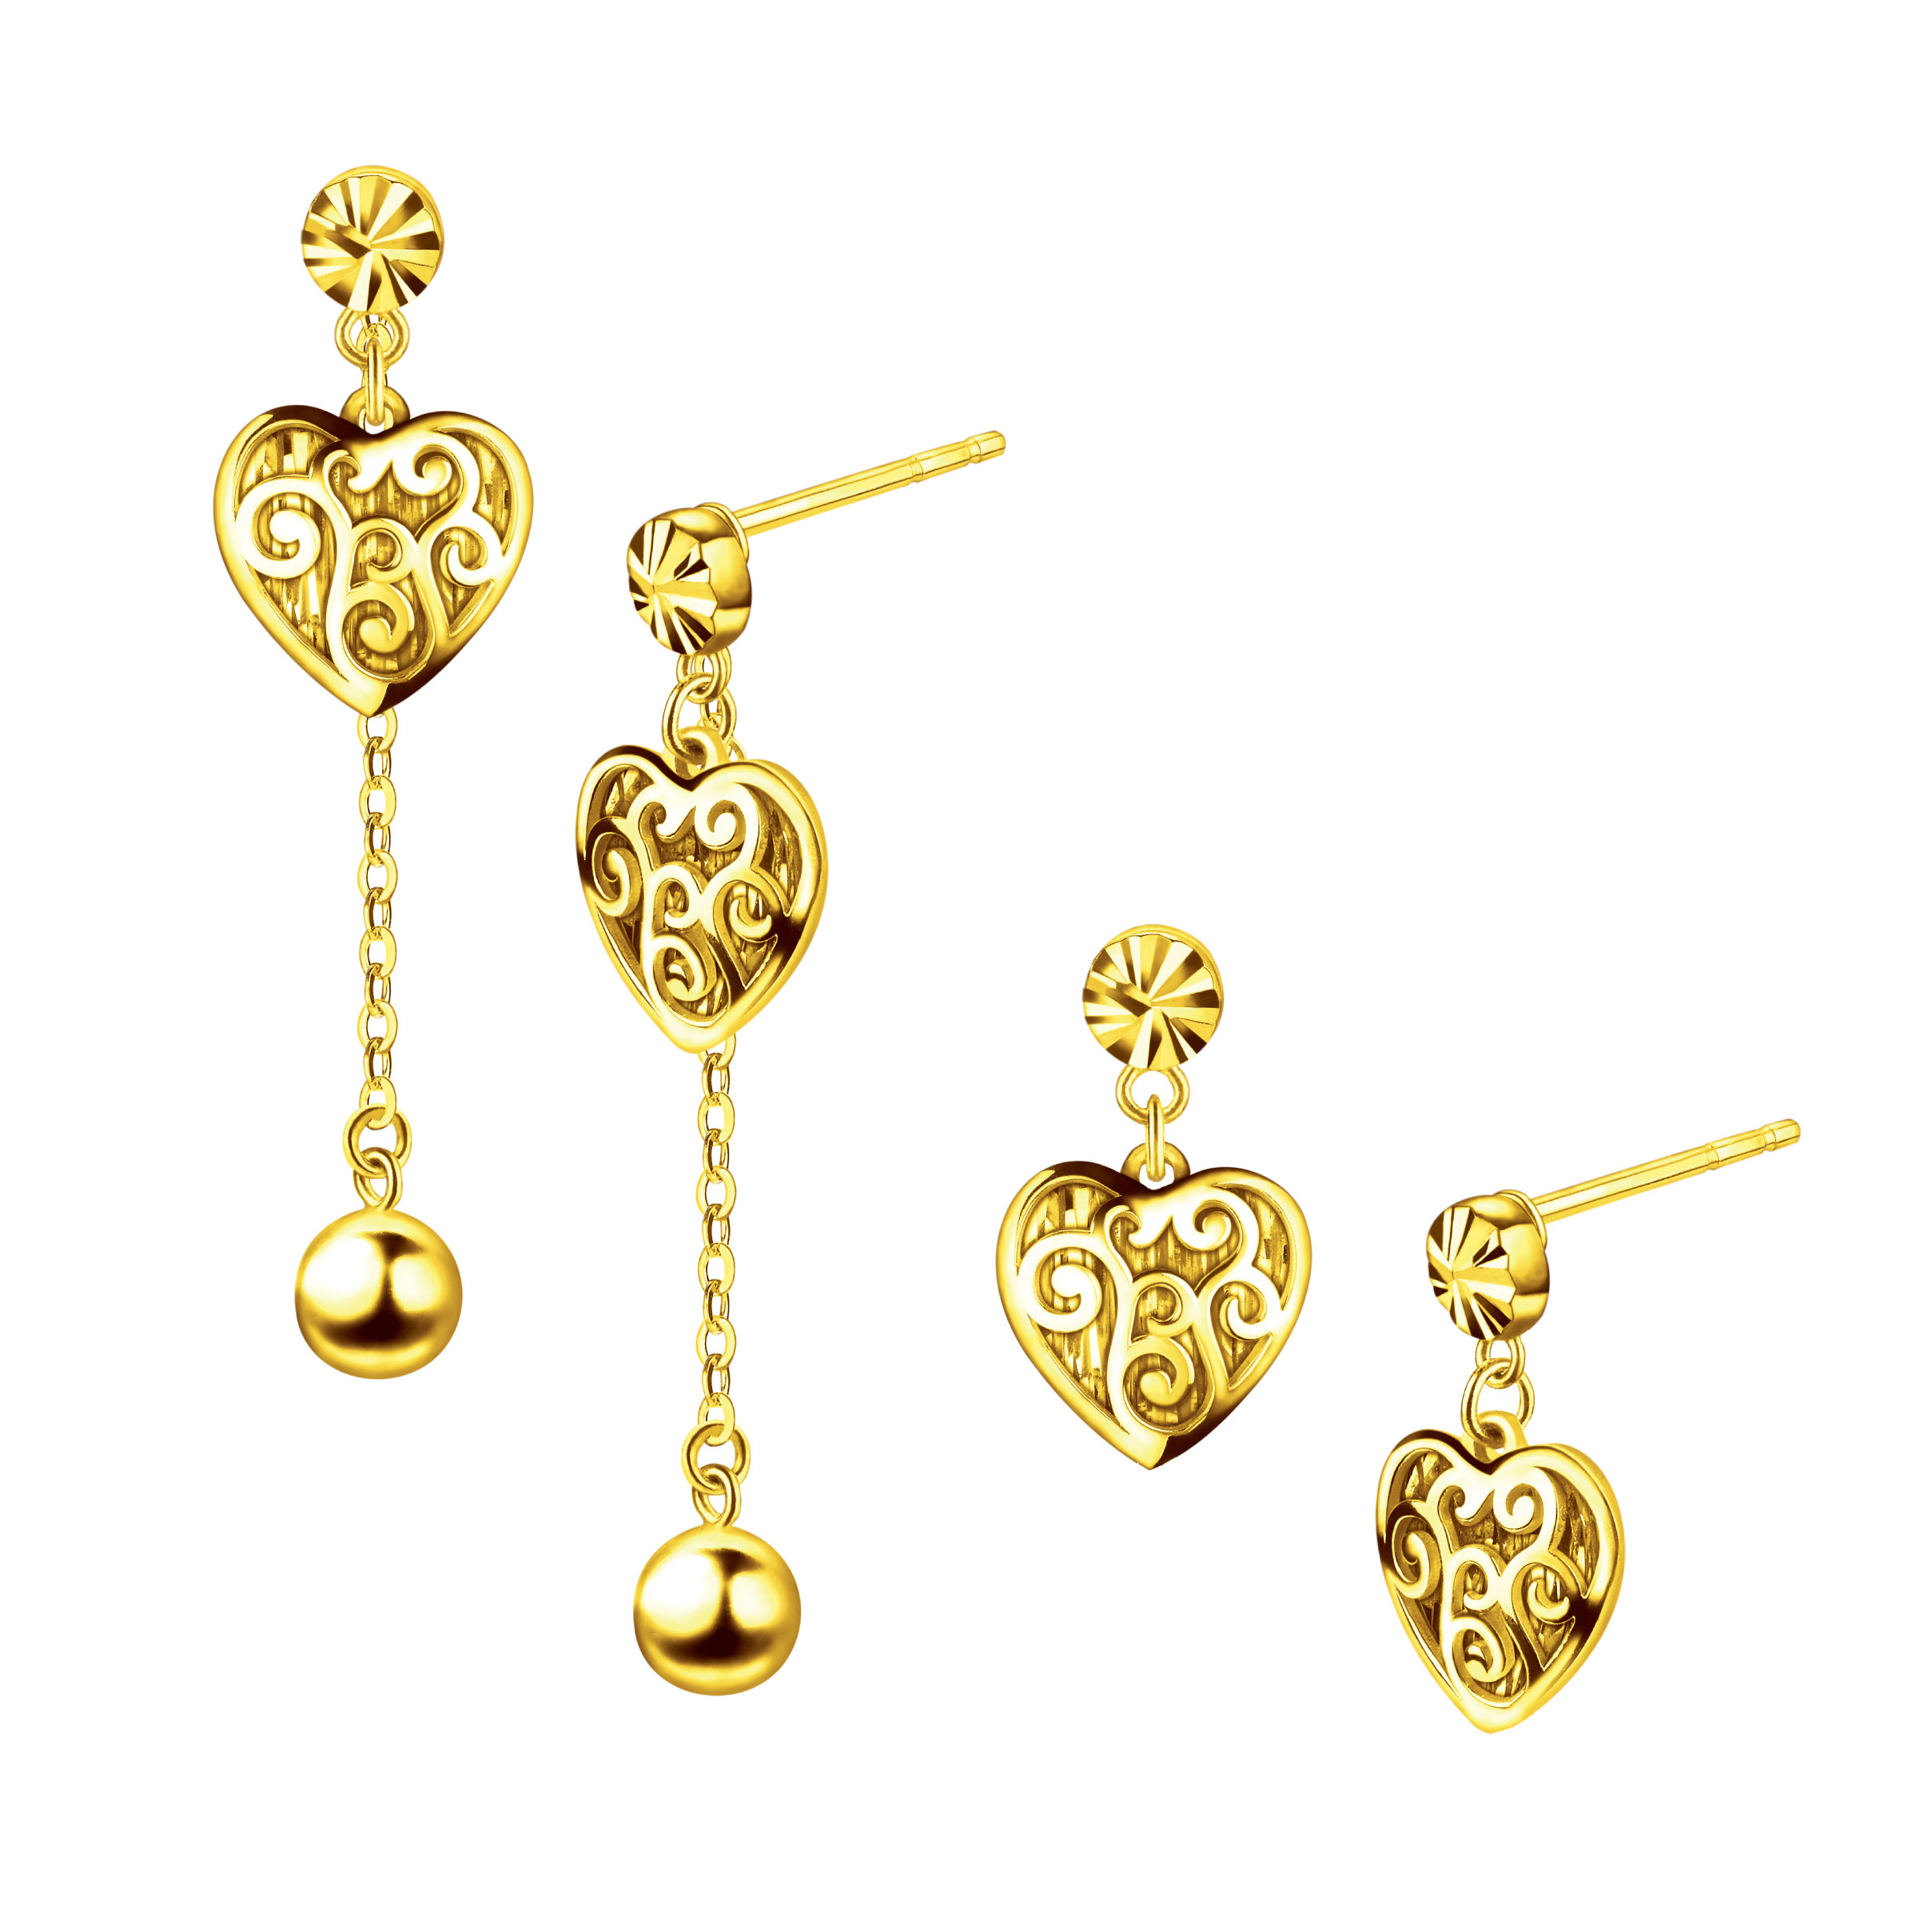 Goldstyle「Beating Heart」Earrings